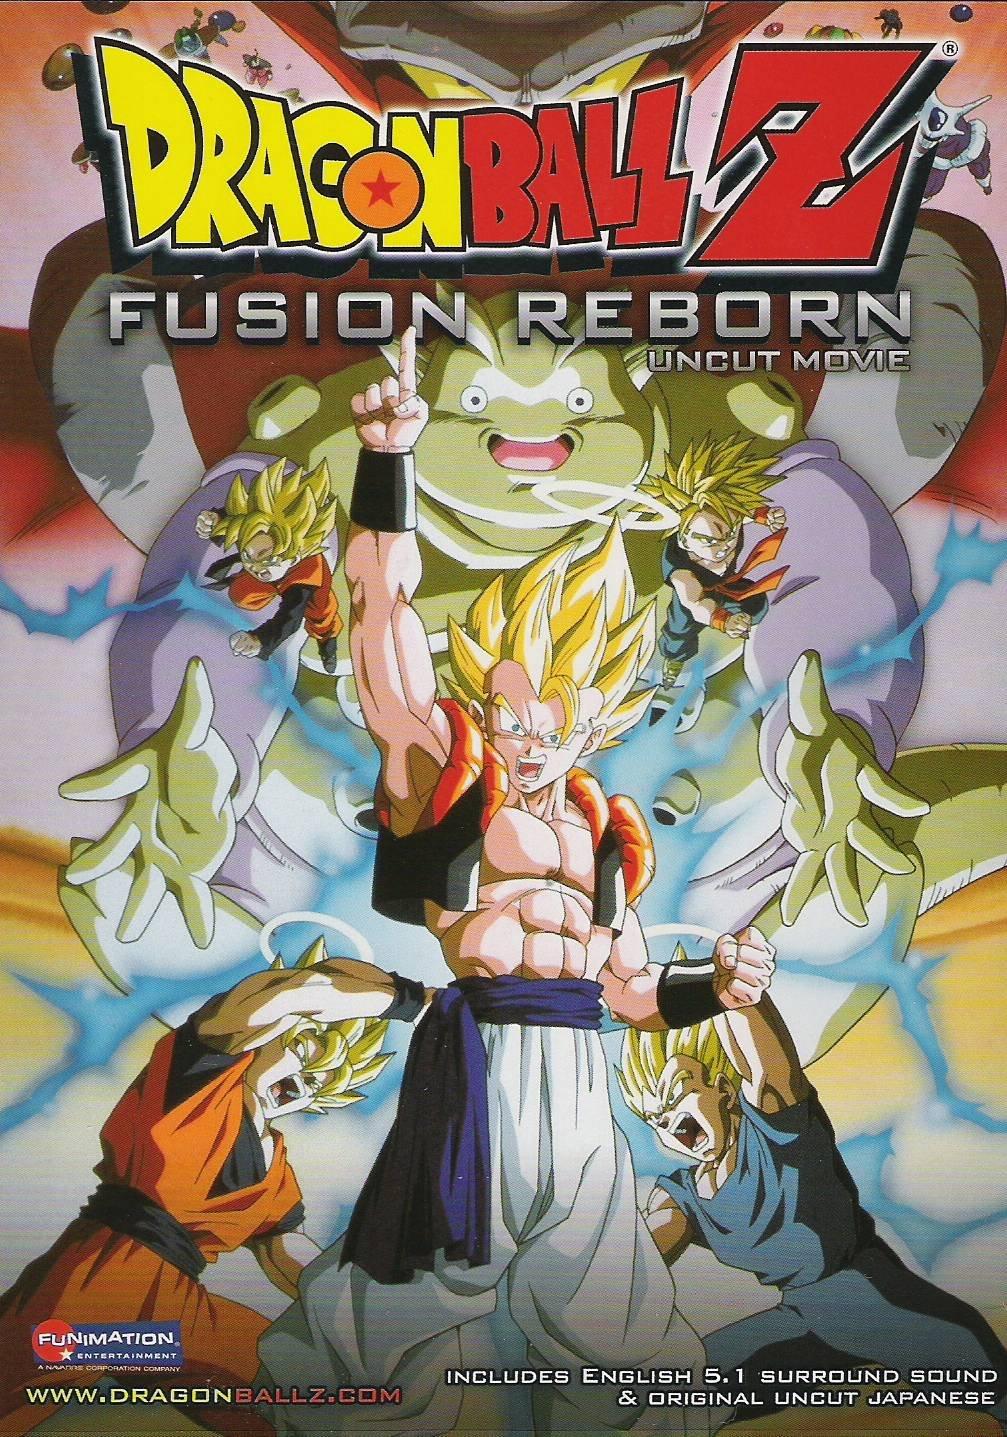 Dragon Ball Z The Movie 12 Rivival Fusion ฟิวชั่นของโกคูและเบจิต้า